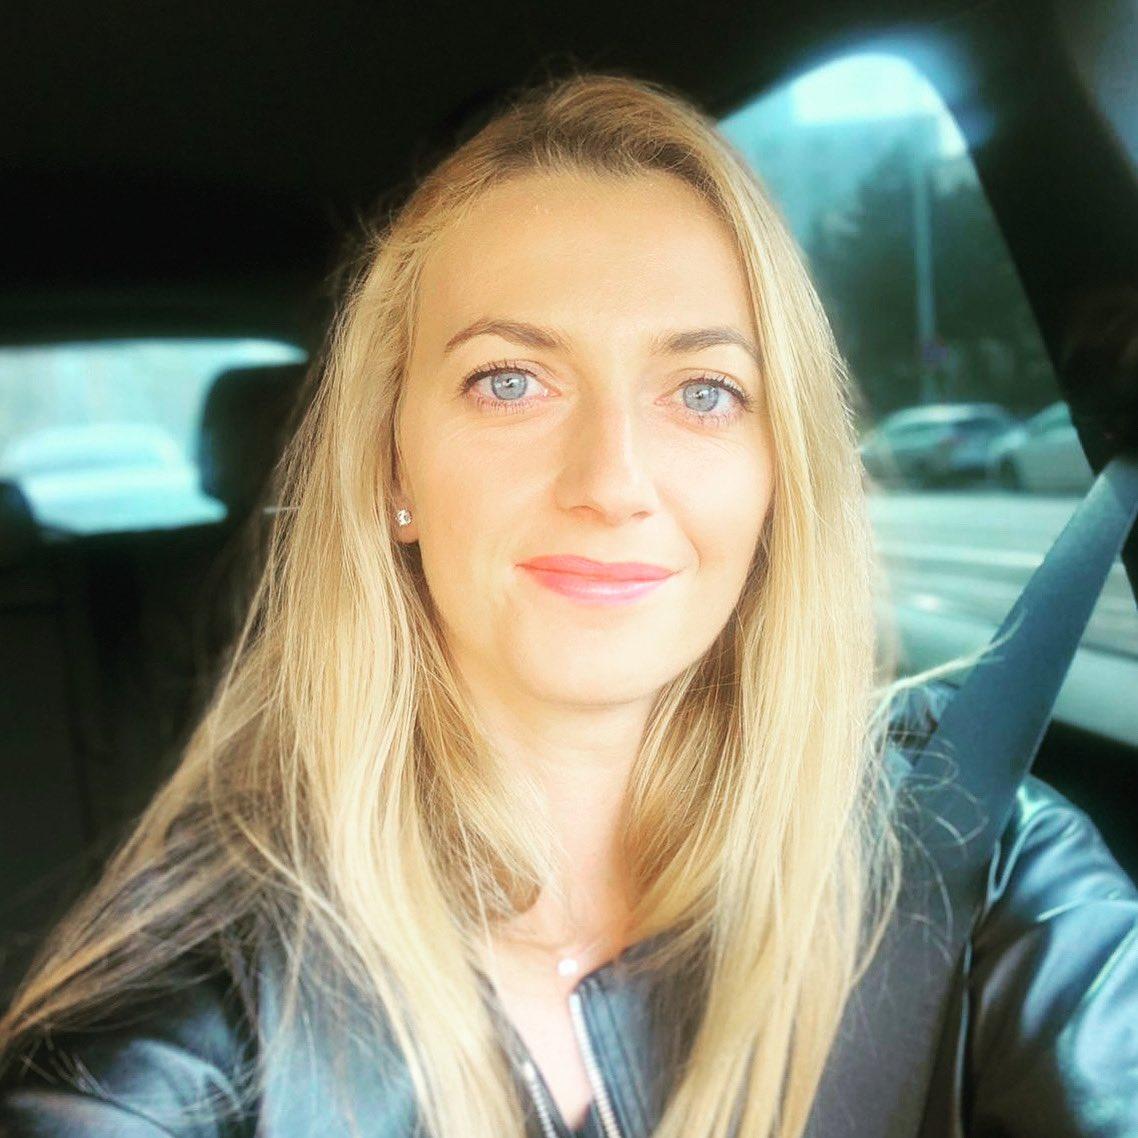 Petra Kvitova @Petra_Kvitova